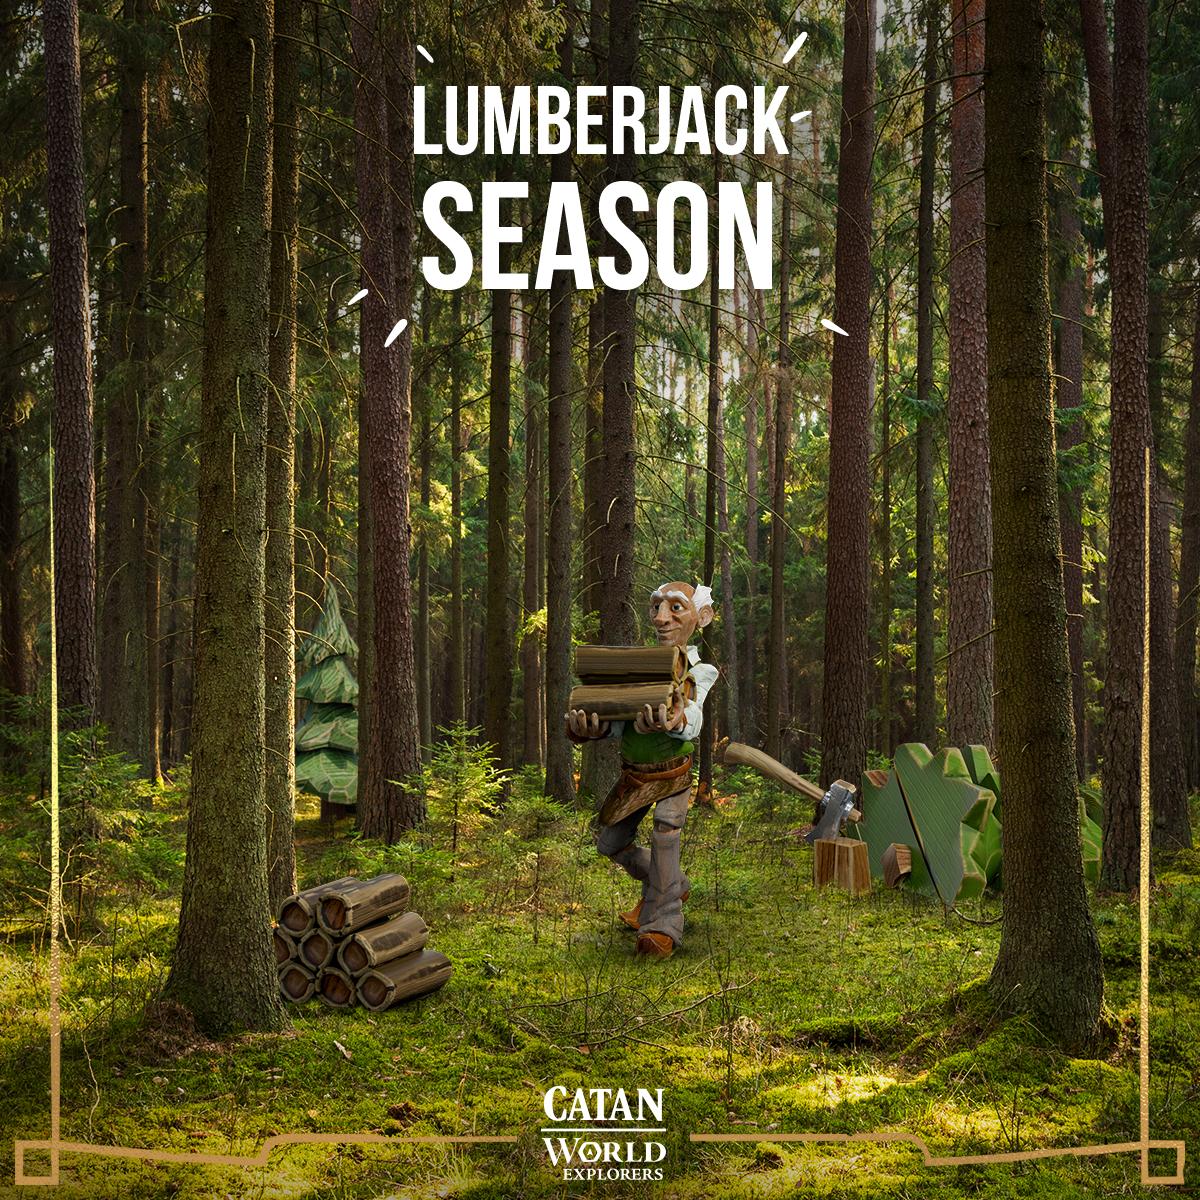 Catan_Lumber Season Announcement_1x1.jpg